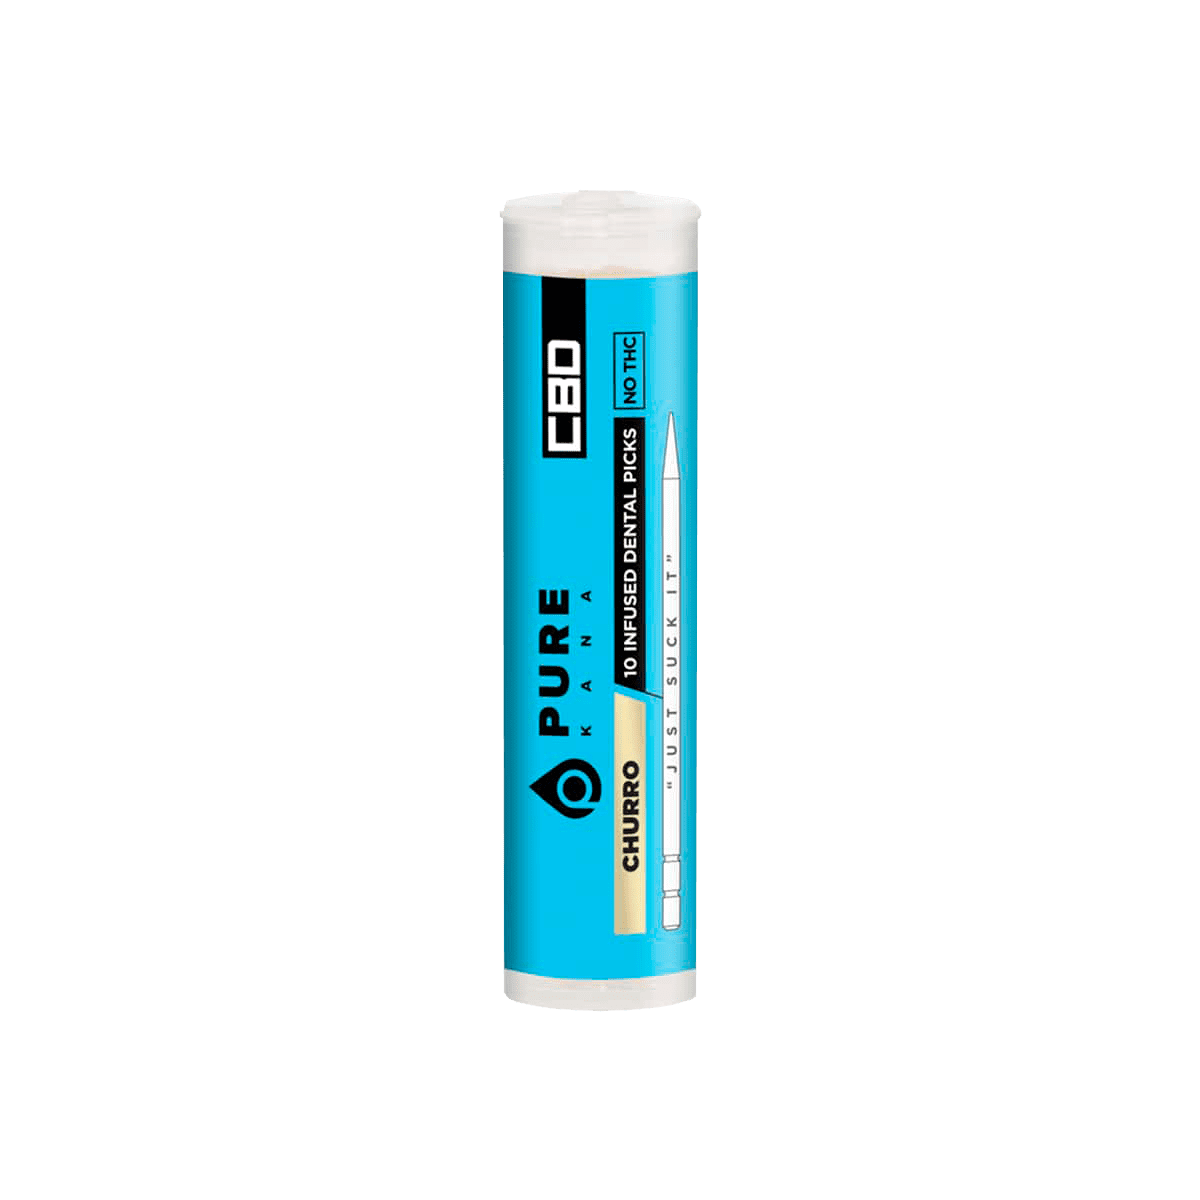 PureKana Churro CBD Pure Picks – 250mg (25mg CBD Per Pick)